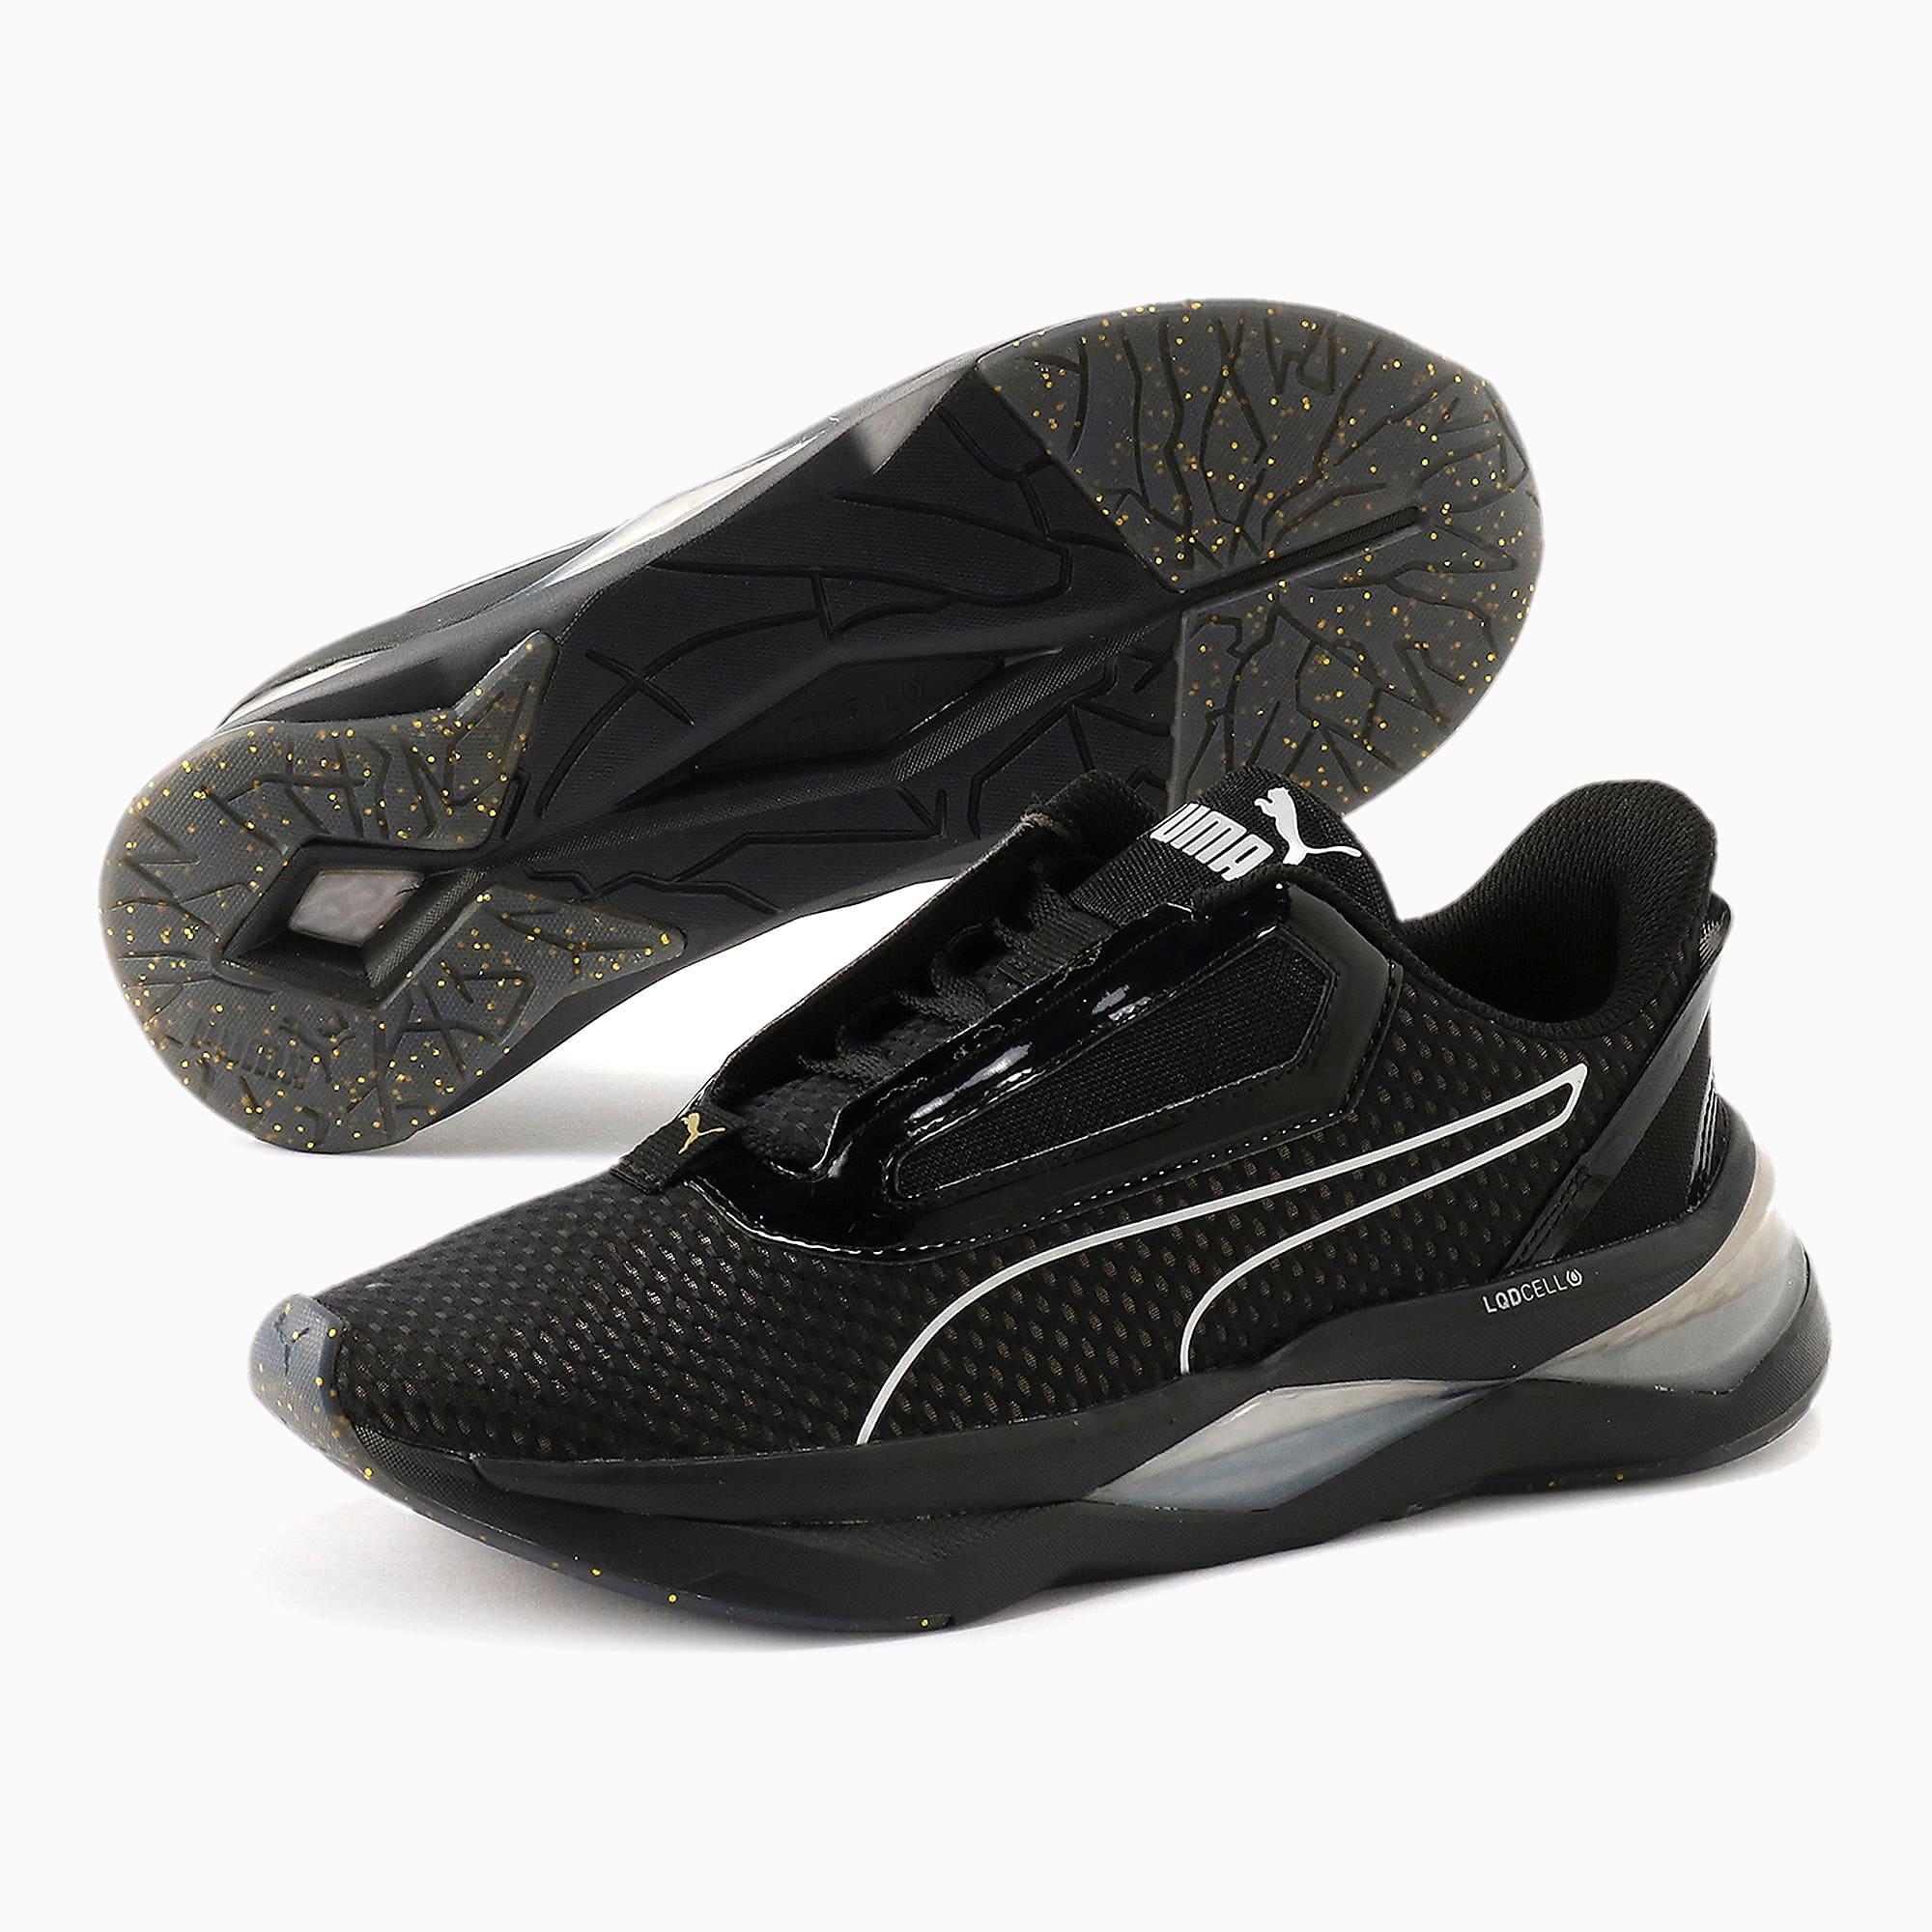 LQDCELL Shatter XT Metal Women's Training Shoes